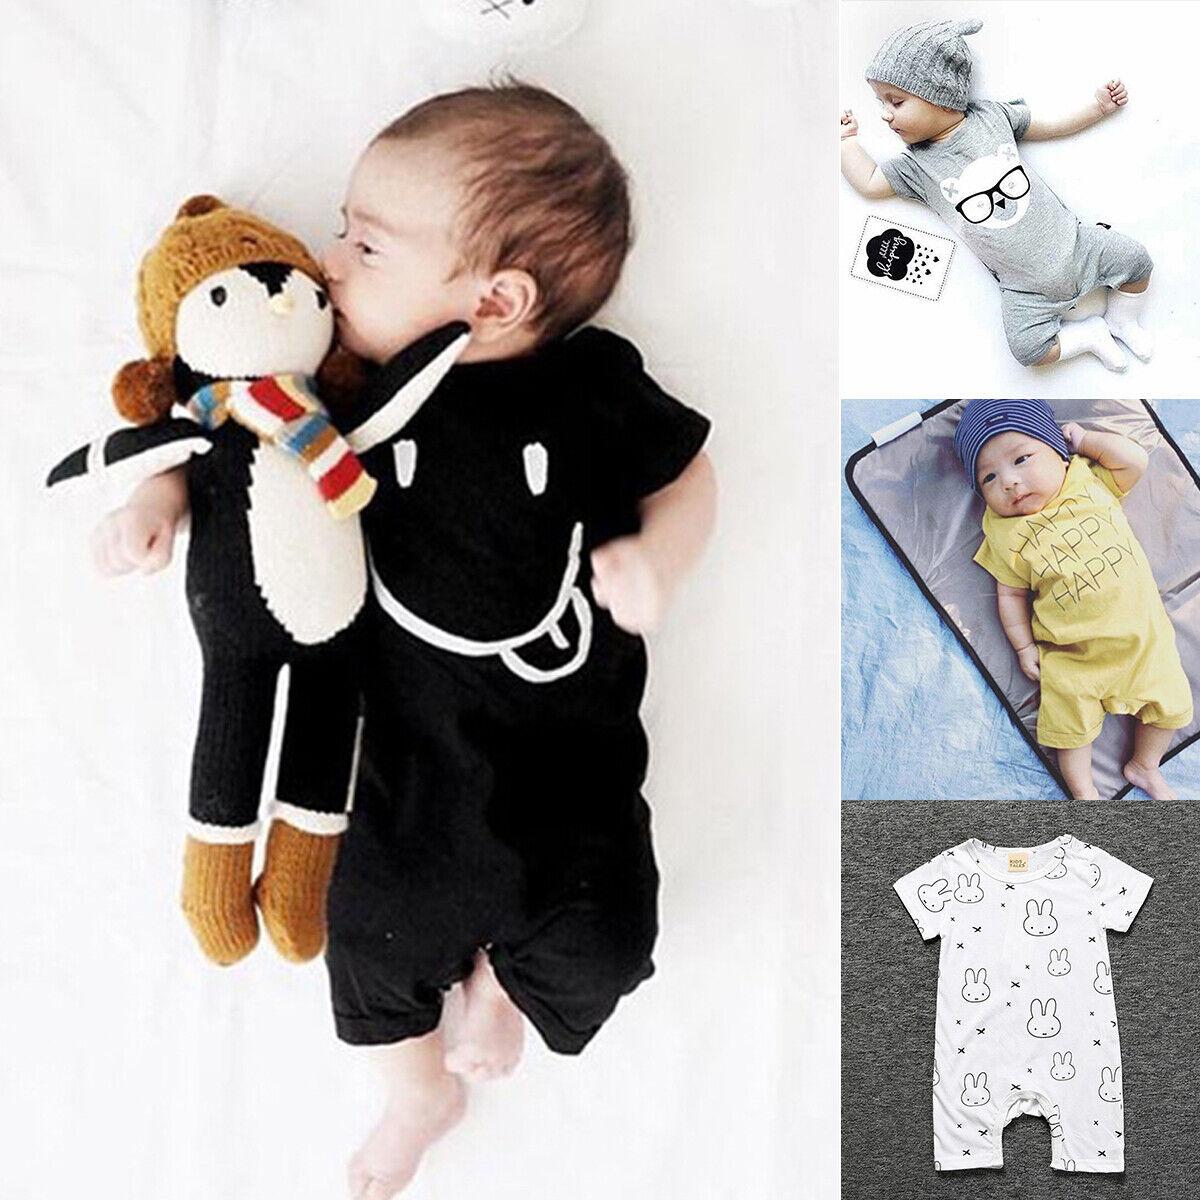 Newborn Toddler Baby Boy Girl Clothes Cotton Romper Bodysuit Kid Jumpsuit Outfit